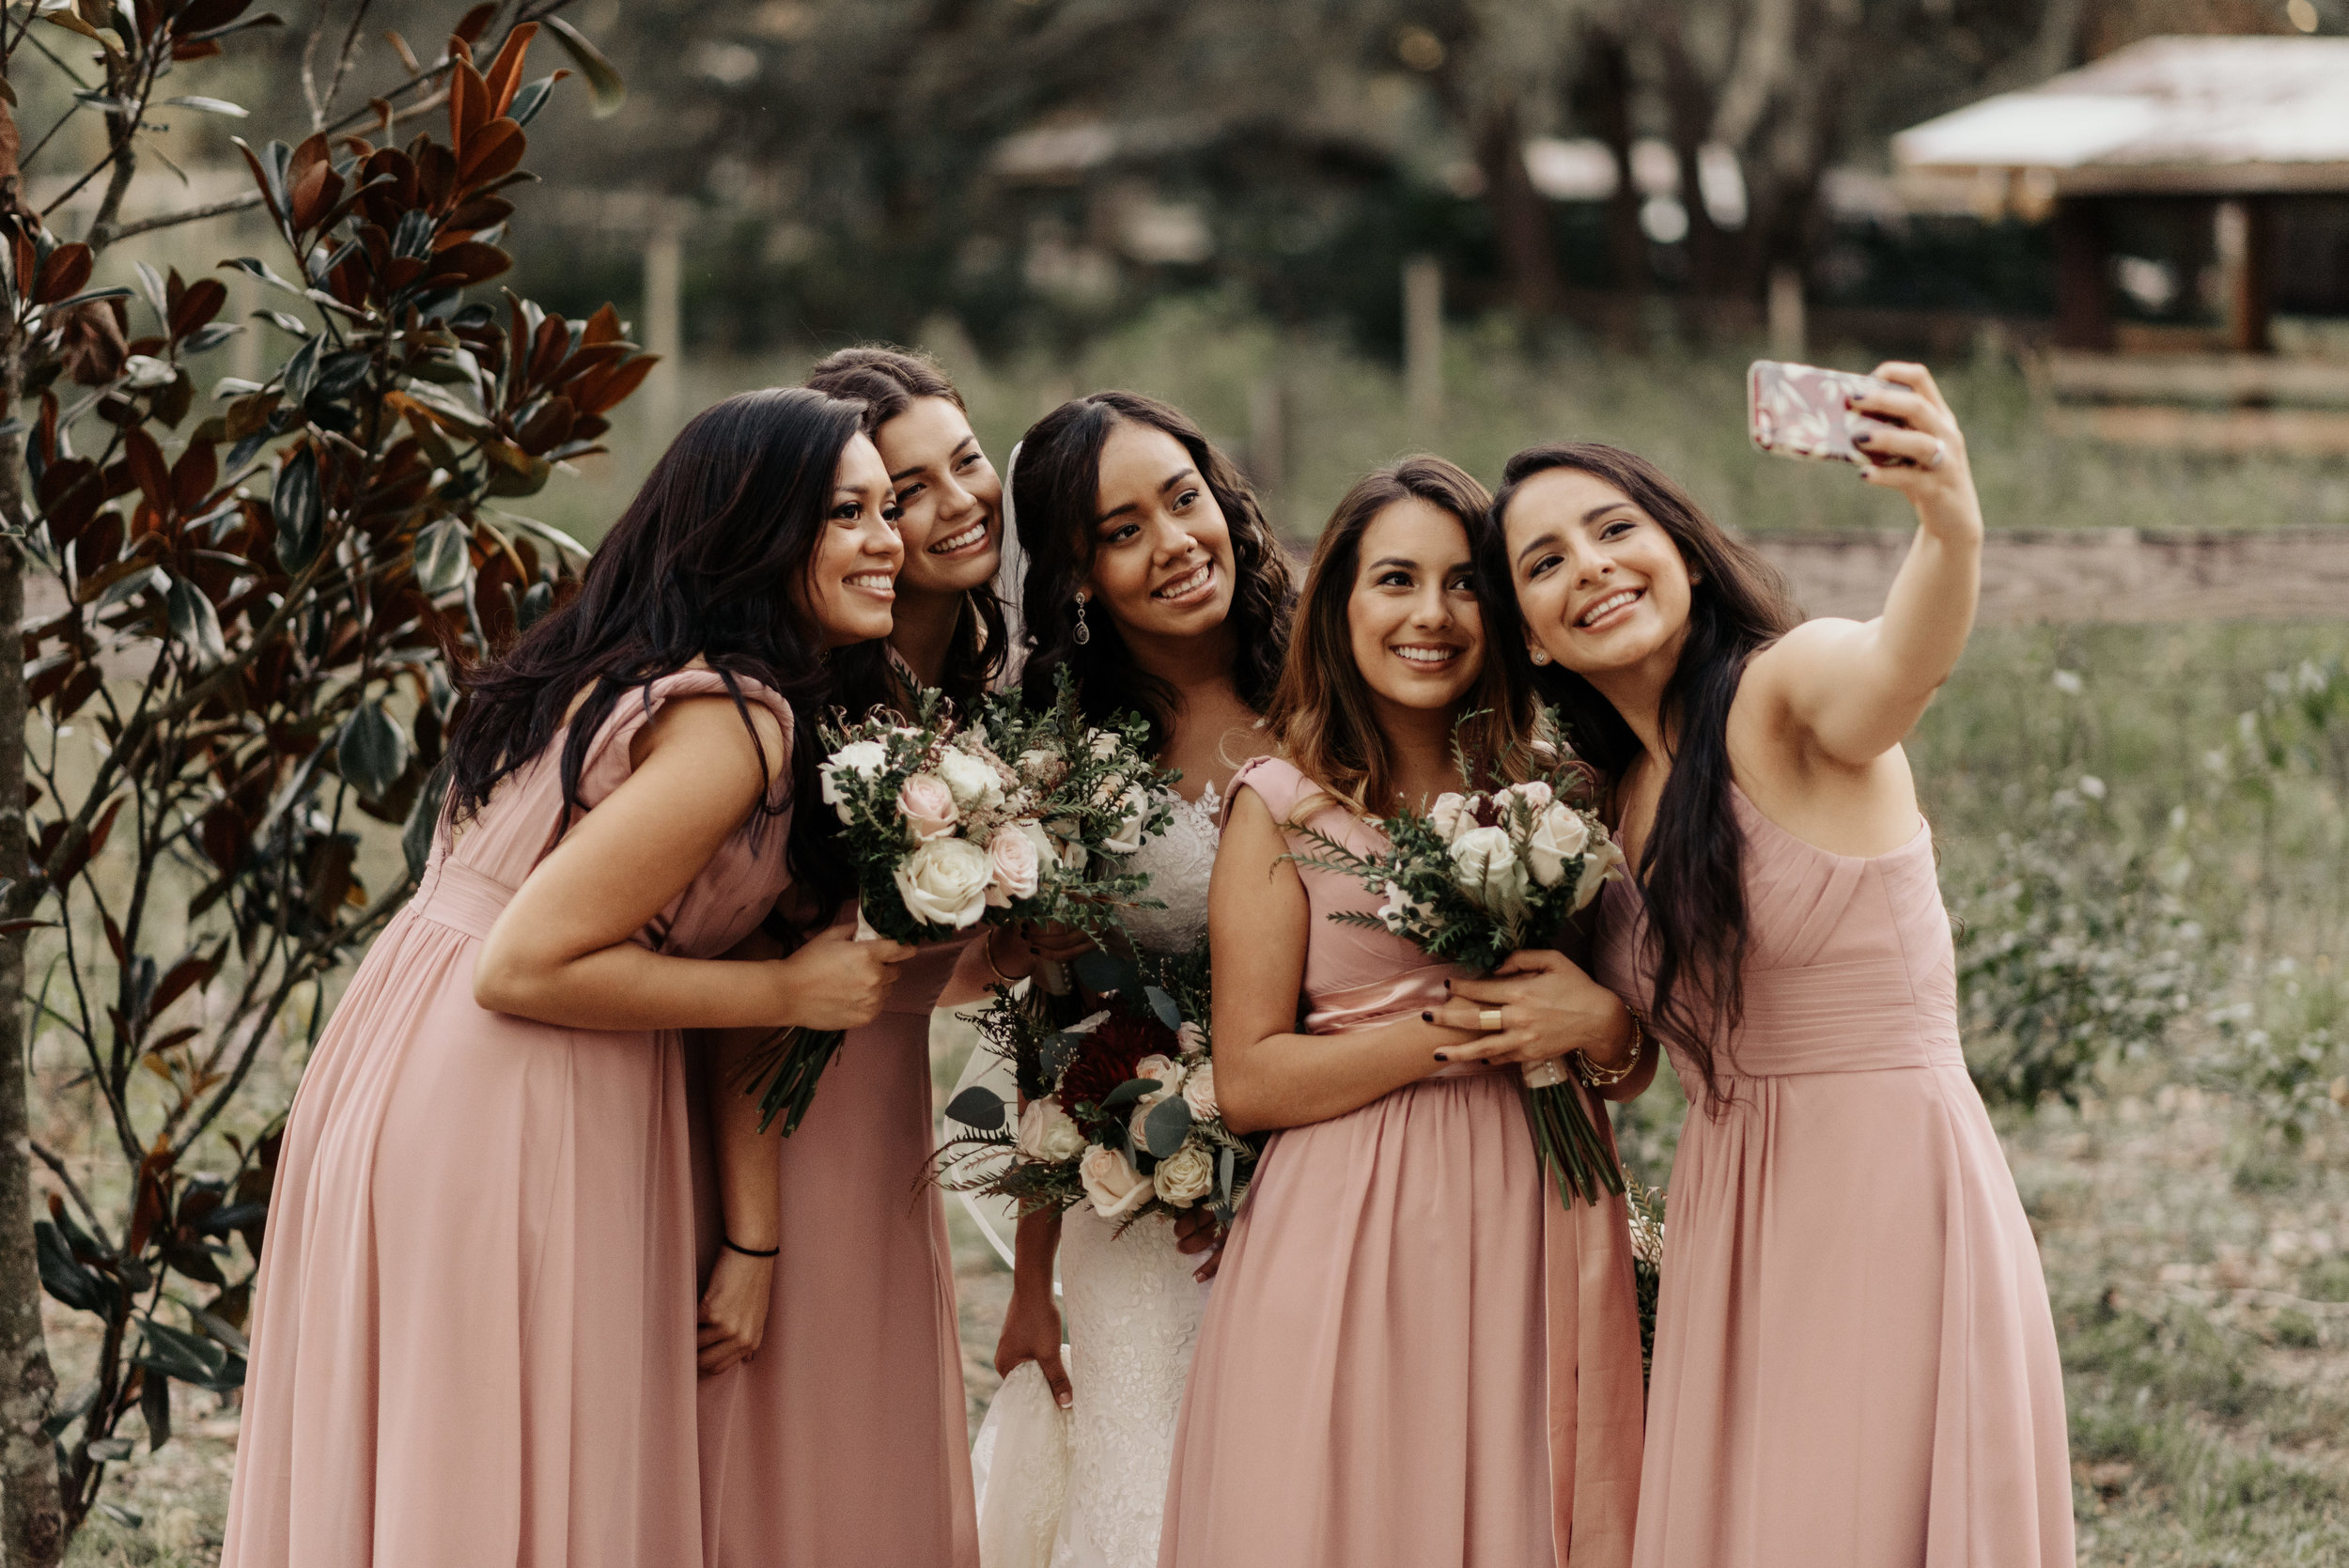 Kirstie-AJ-Wedding-0293.jpg